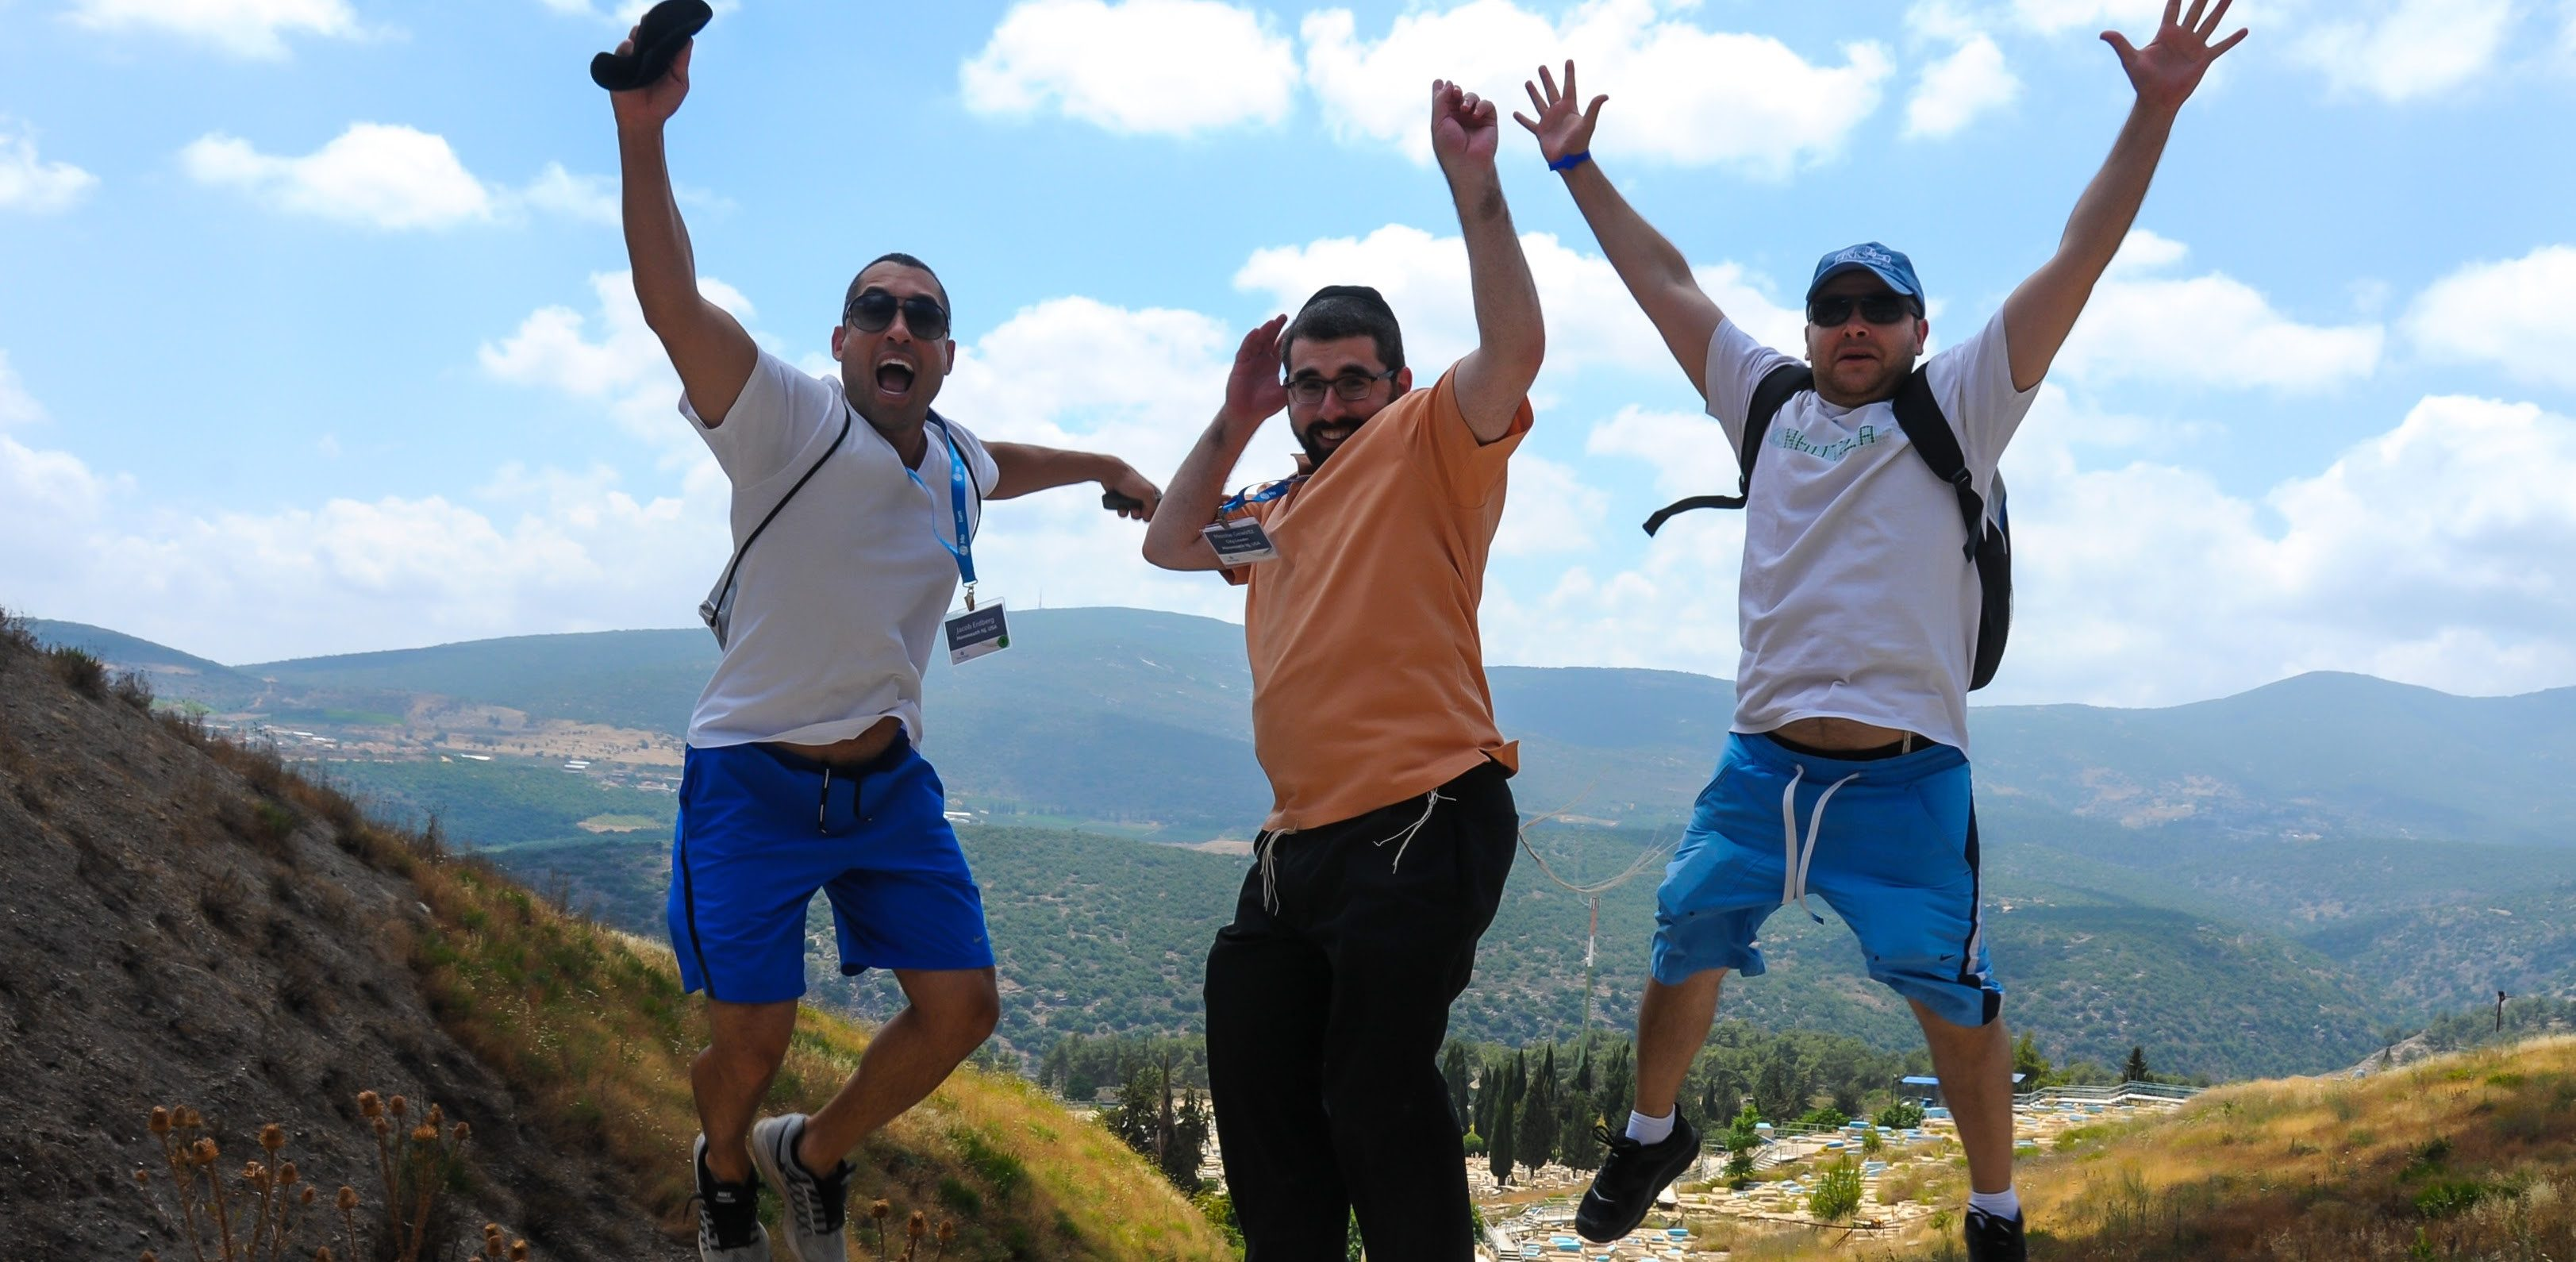 Jumping on Men's Israel Trip